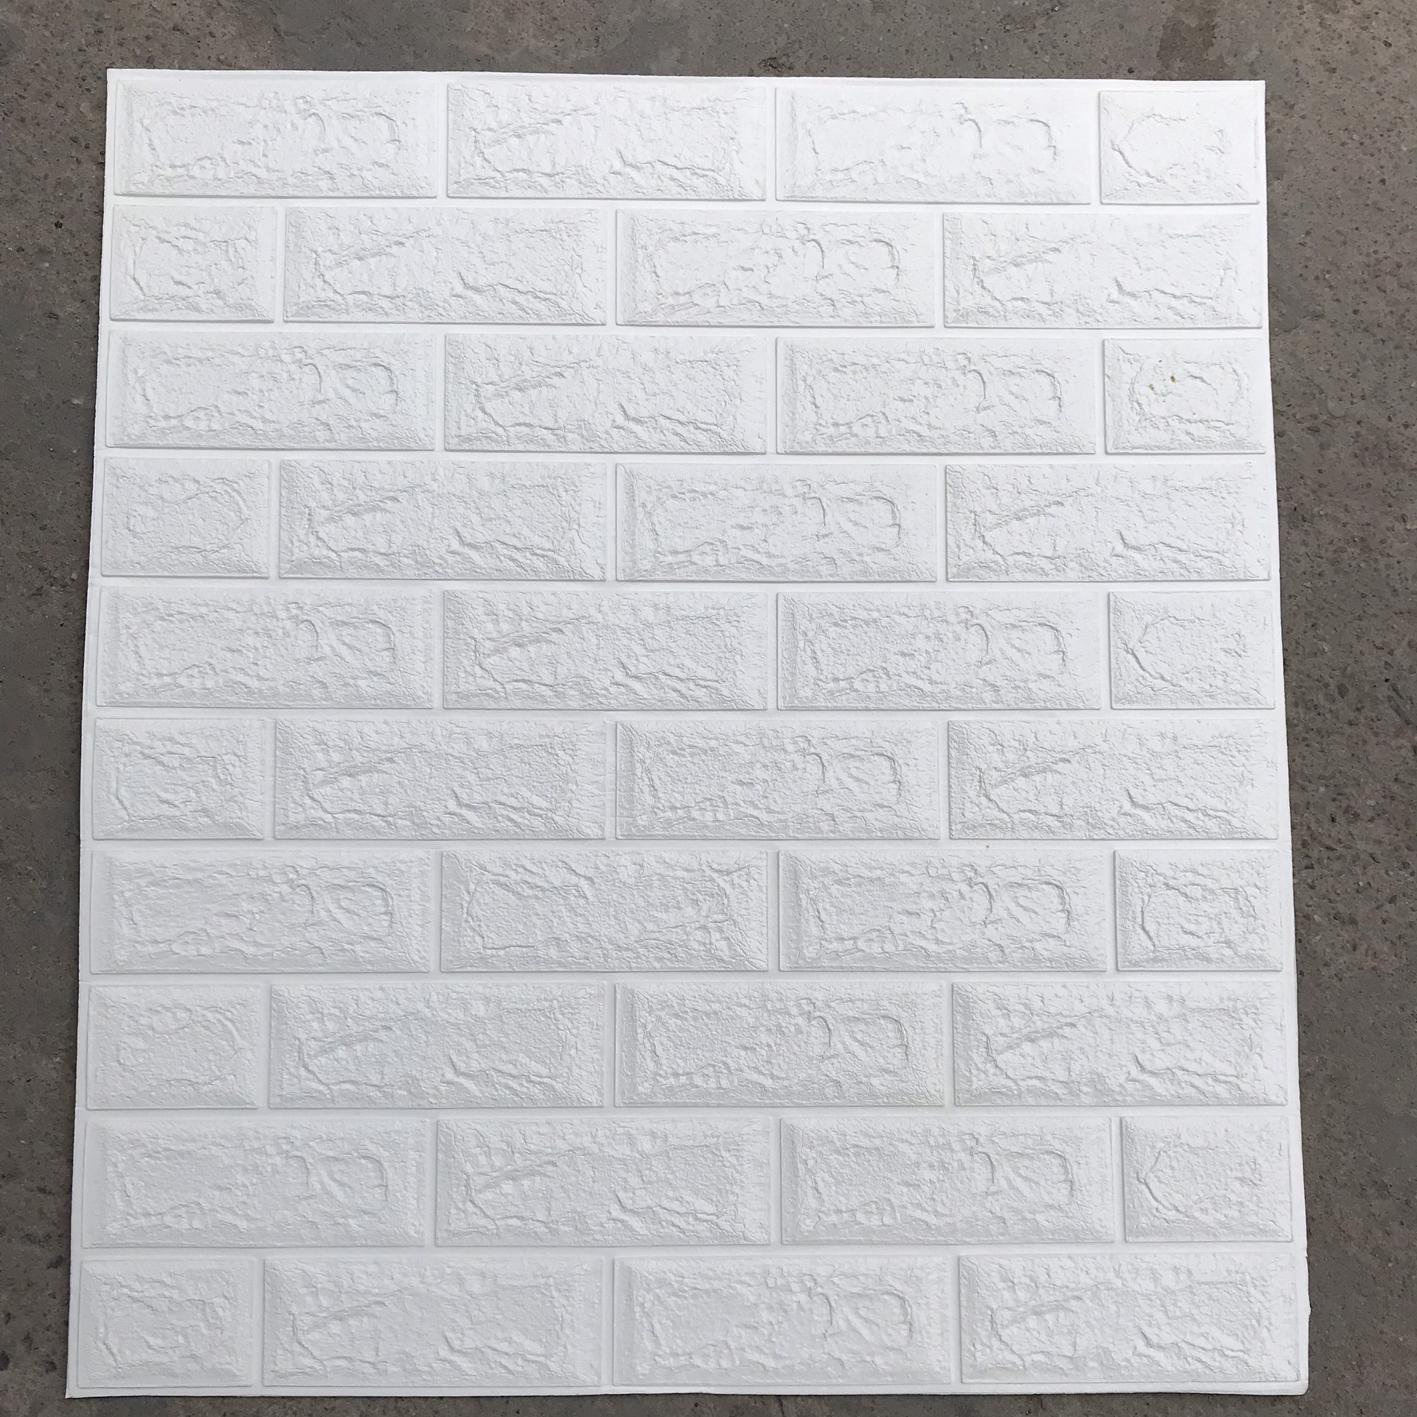 10 Tấm Xốp dán tường giả gạch 3D Bóc dán 70x77cm